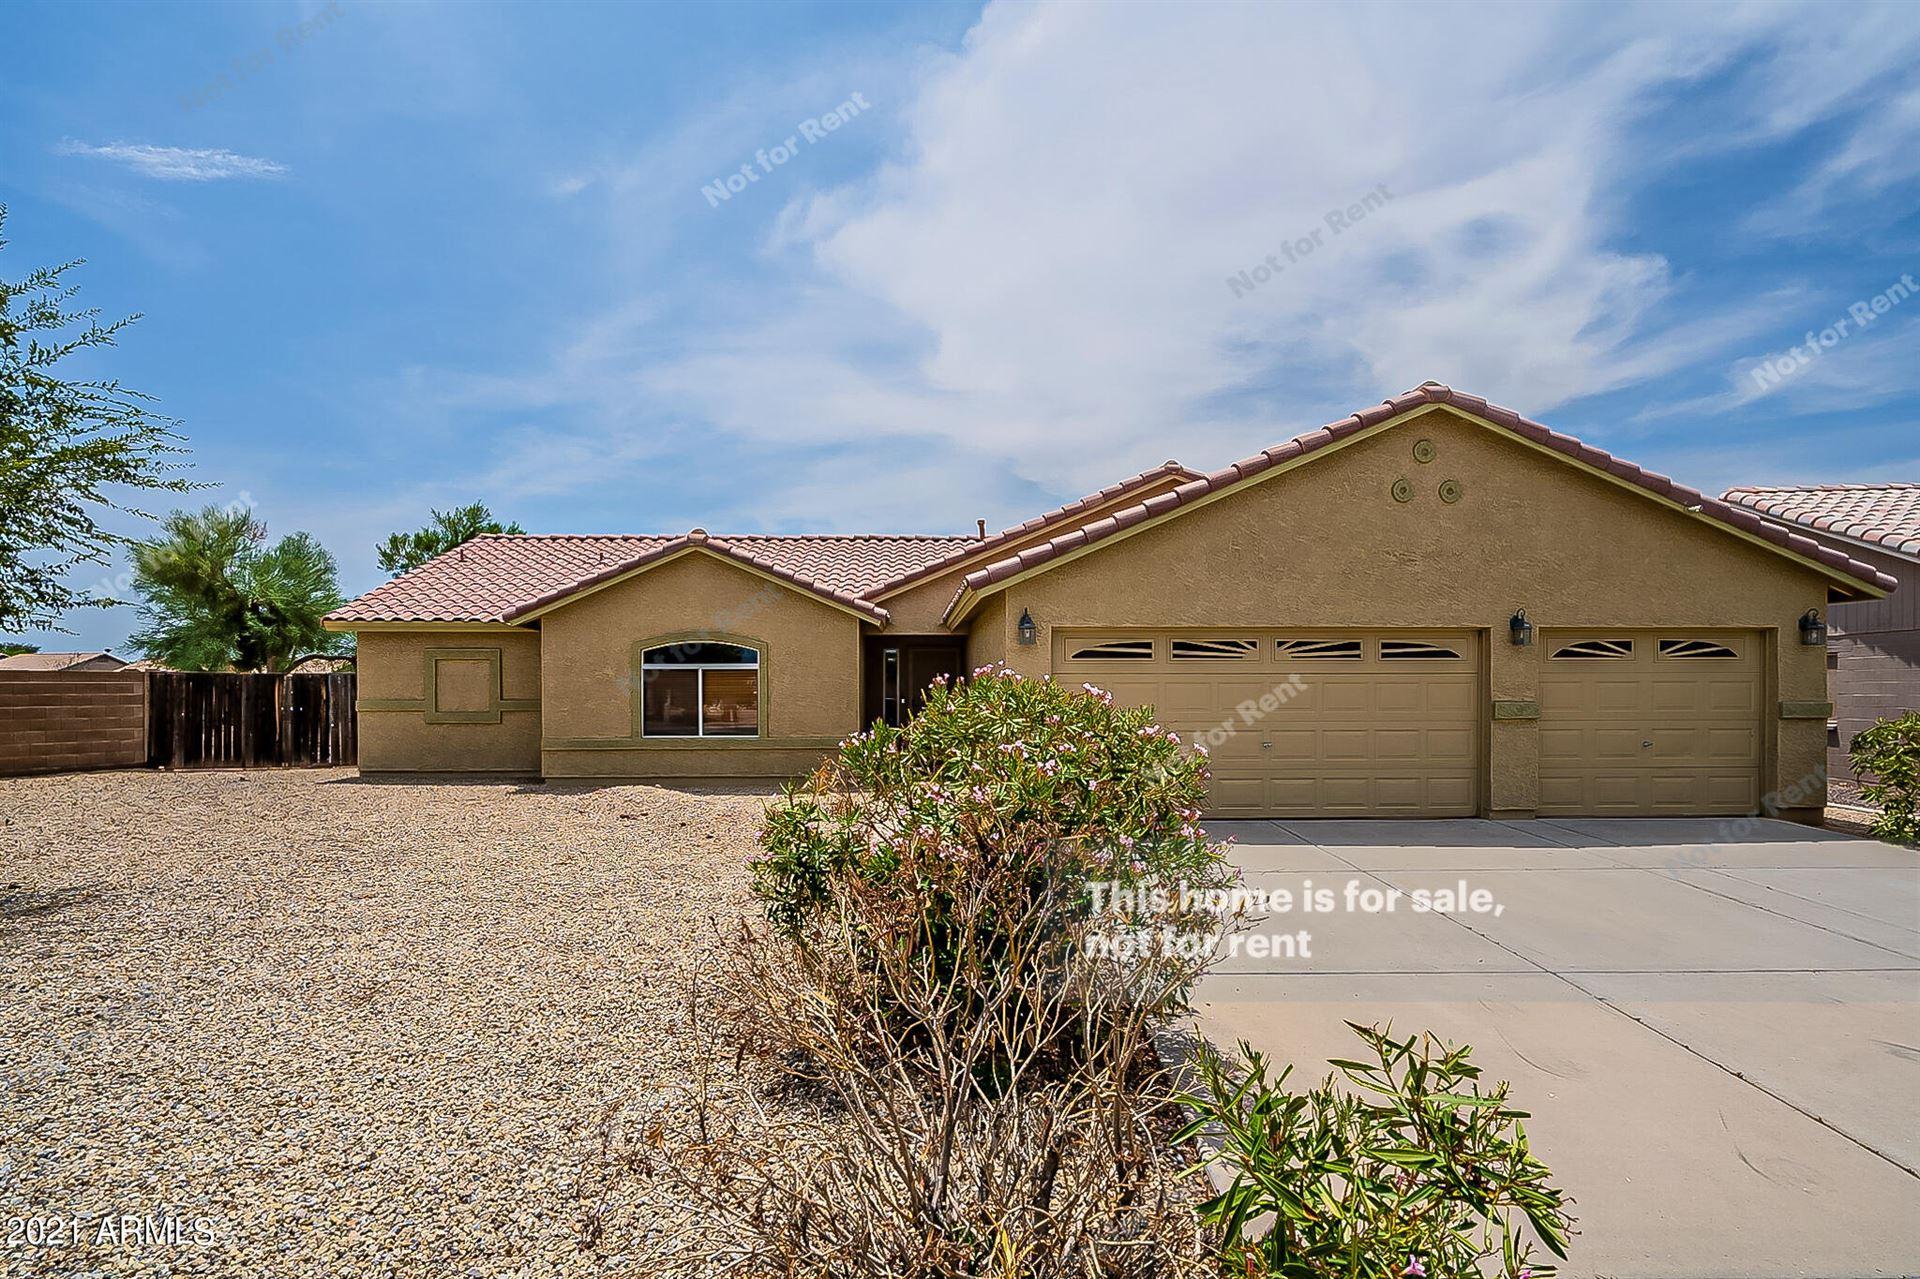 Photo of 1333 W 14TH Avenue, Apache Junction, AZ 85120 (MLS # 6267961)